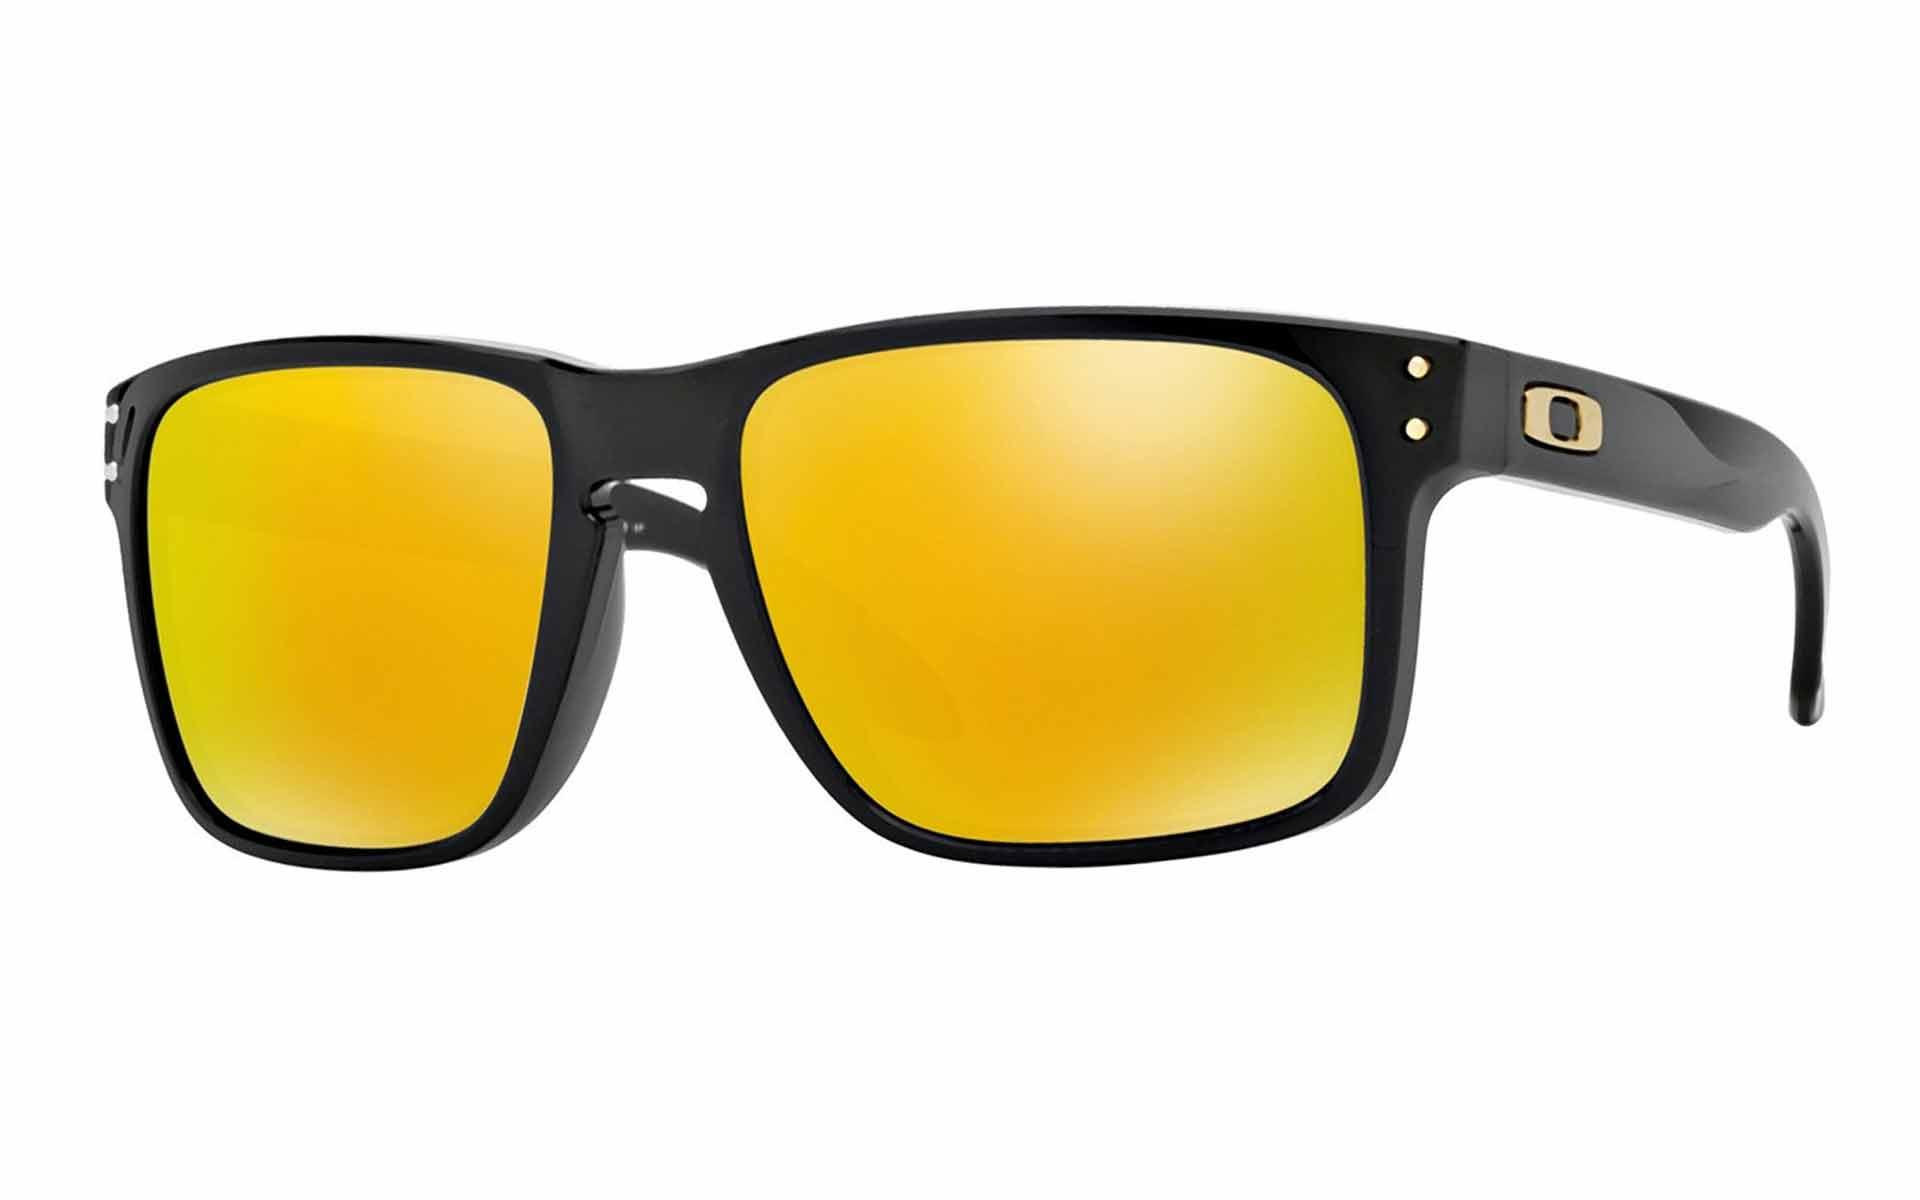 52c77cb956 Shaun White Signature Series Holbrook Sunglasses